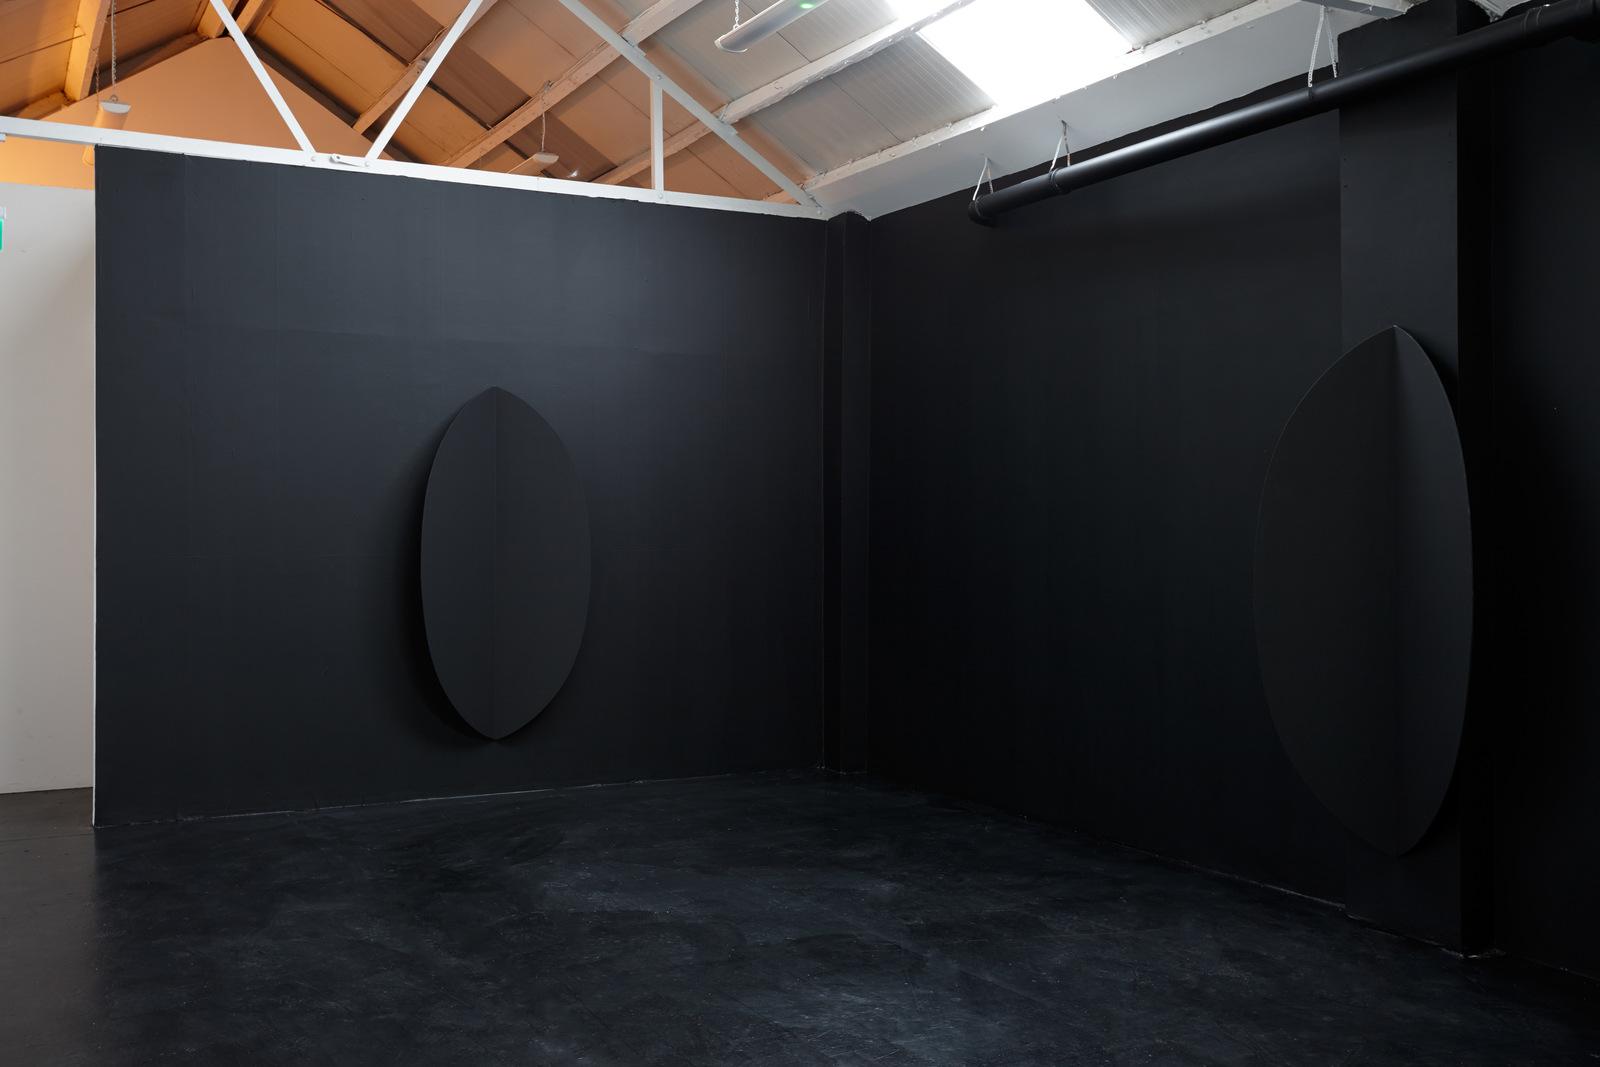 Ryan Estep - 5 - Installation View IX